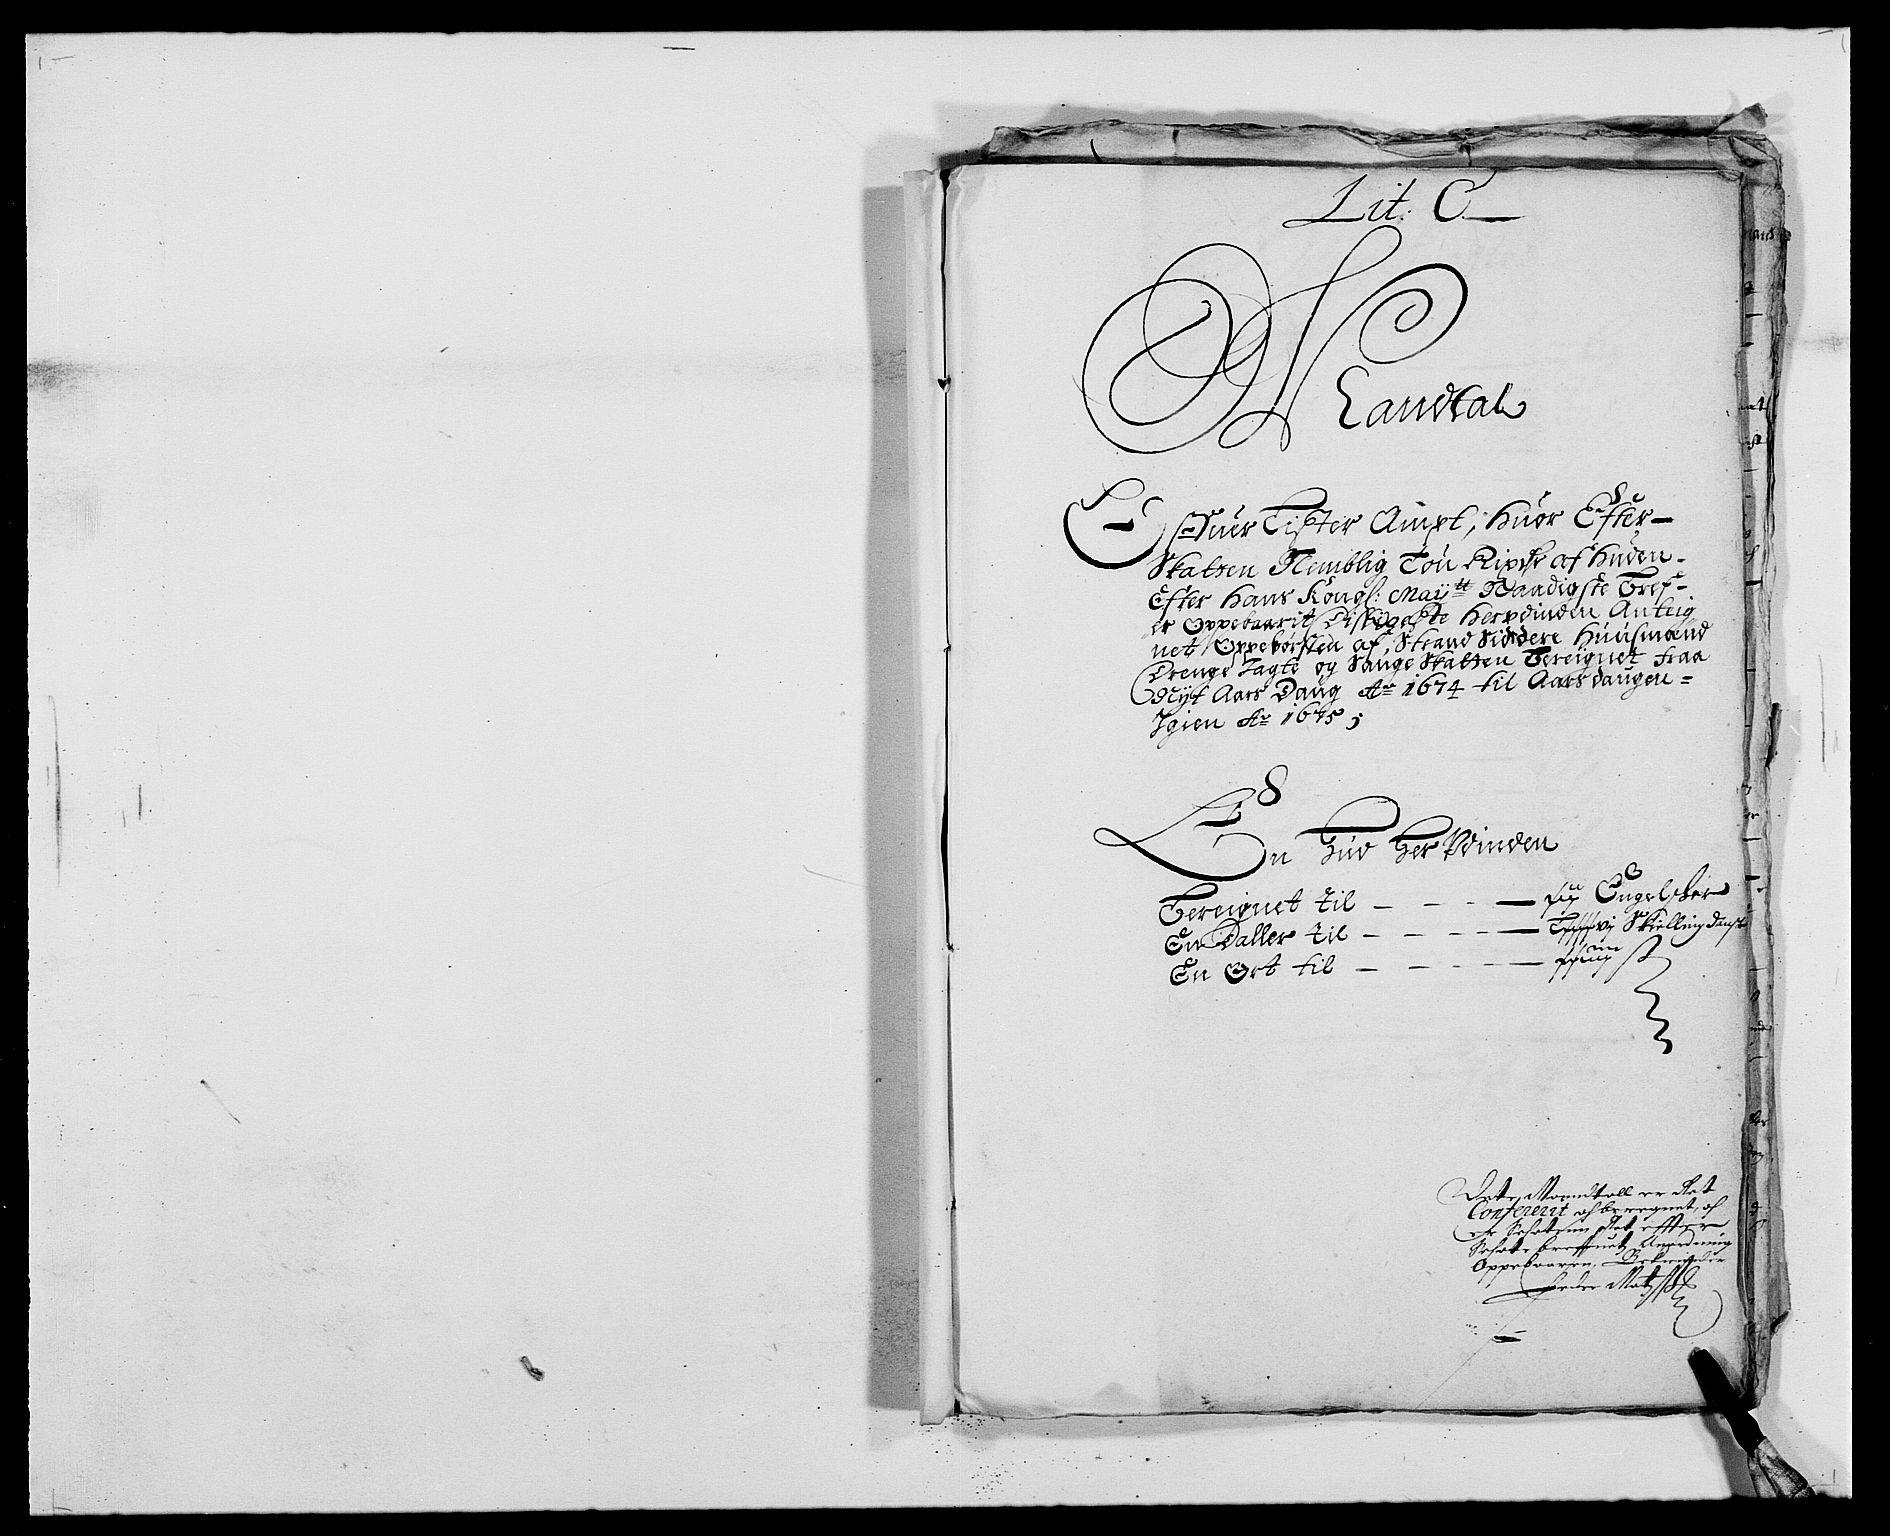 RA, Rentekammeret inntil 1814, Reviderte regnskaper, Fogderegnskap, R41/L2528: Fogderegnskap Lista, 1673-1674, s. 228